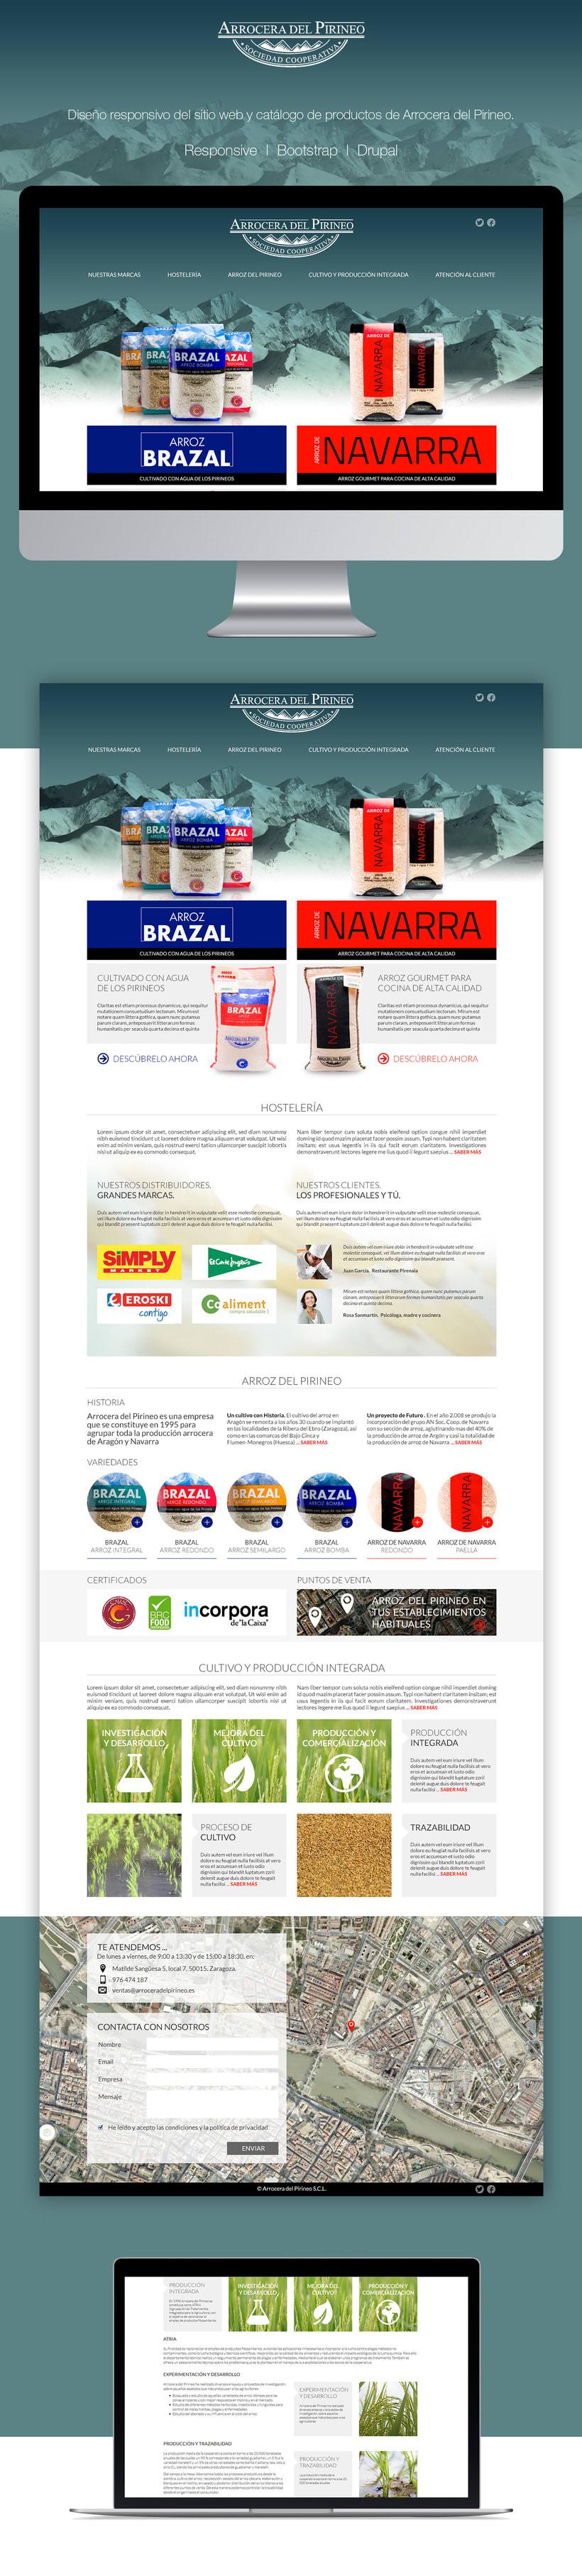 Arrocera del Pirineo | Website -1